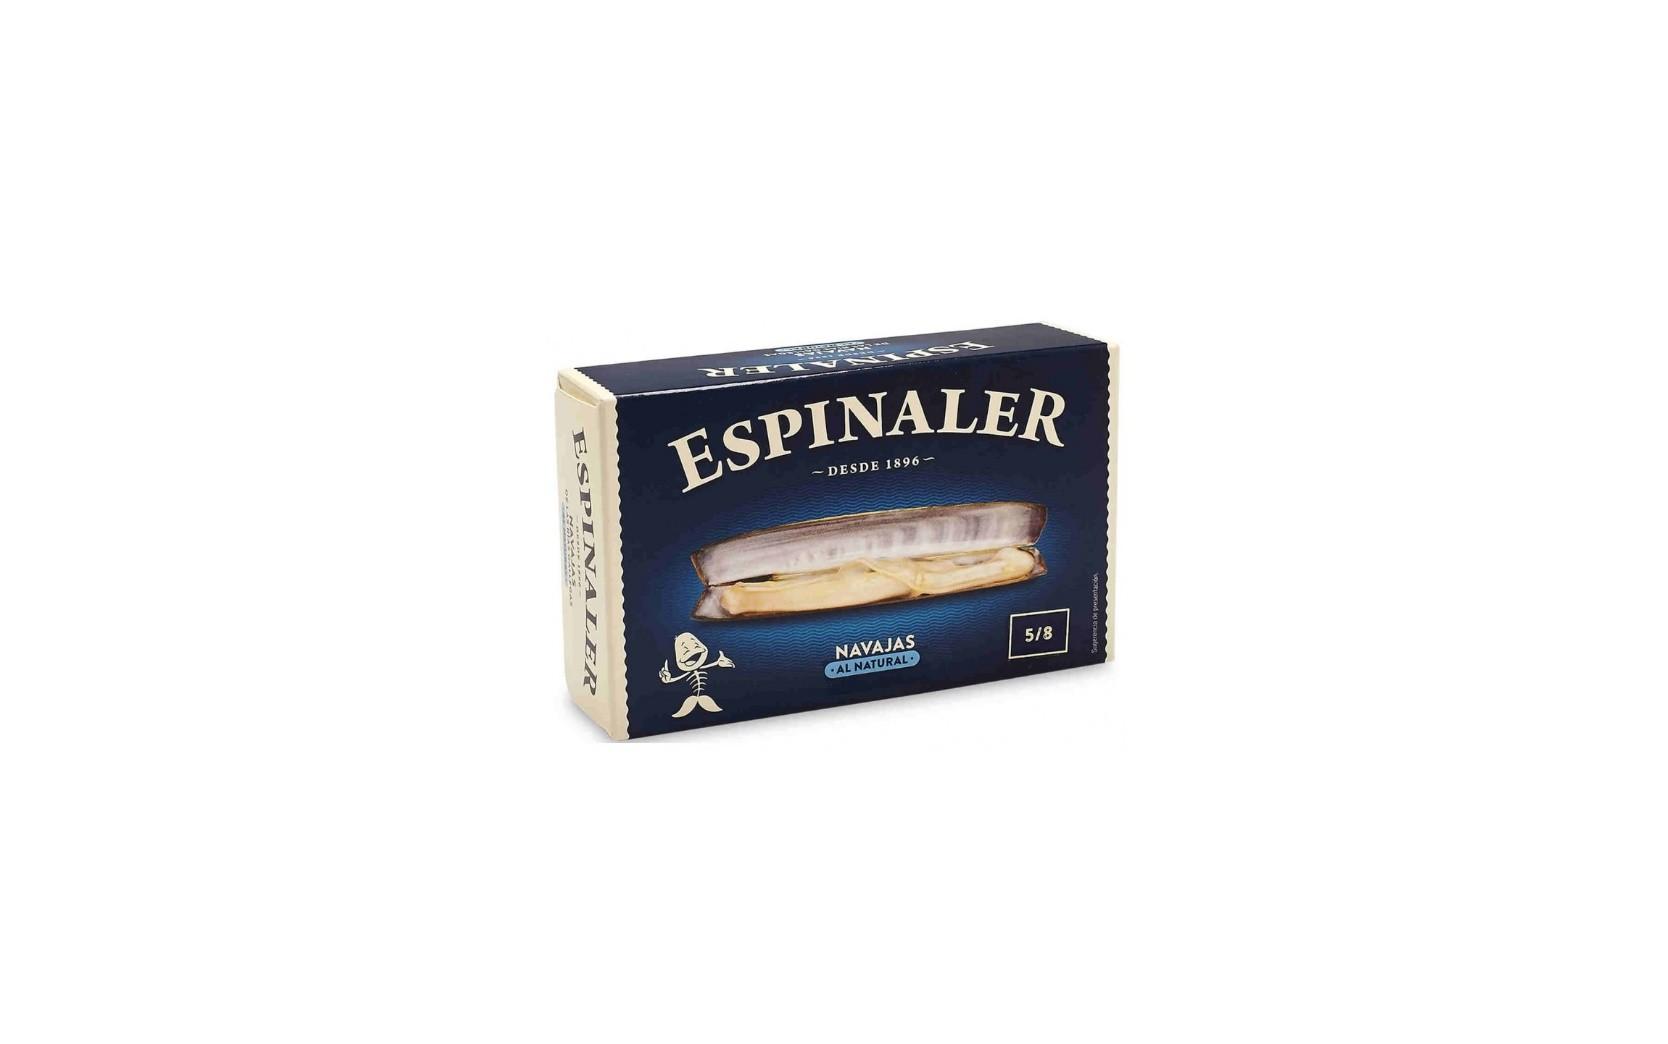 NAVALLES ESPINALER OL-120 5/8